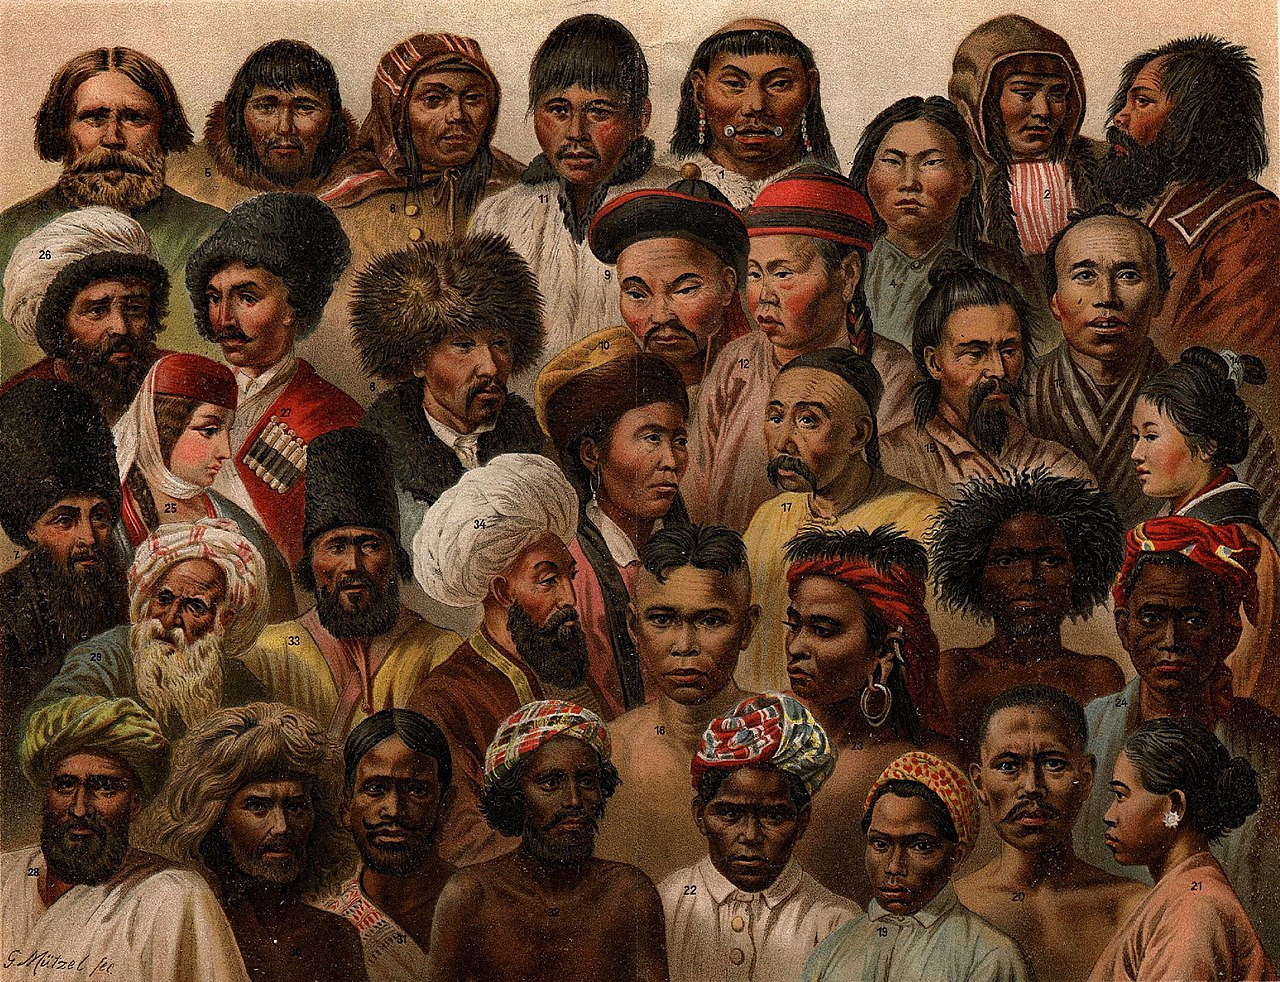 different ethnicities